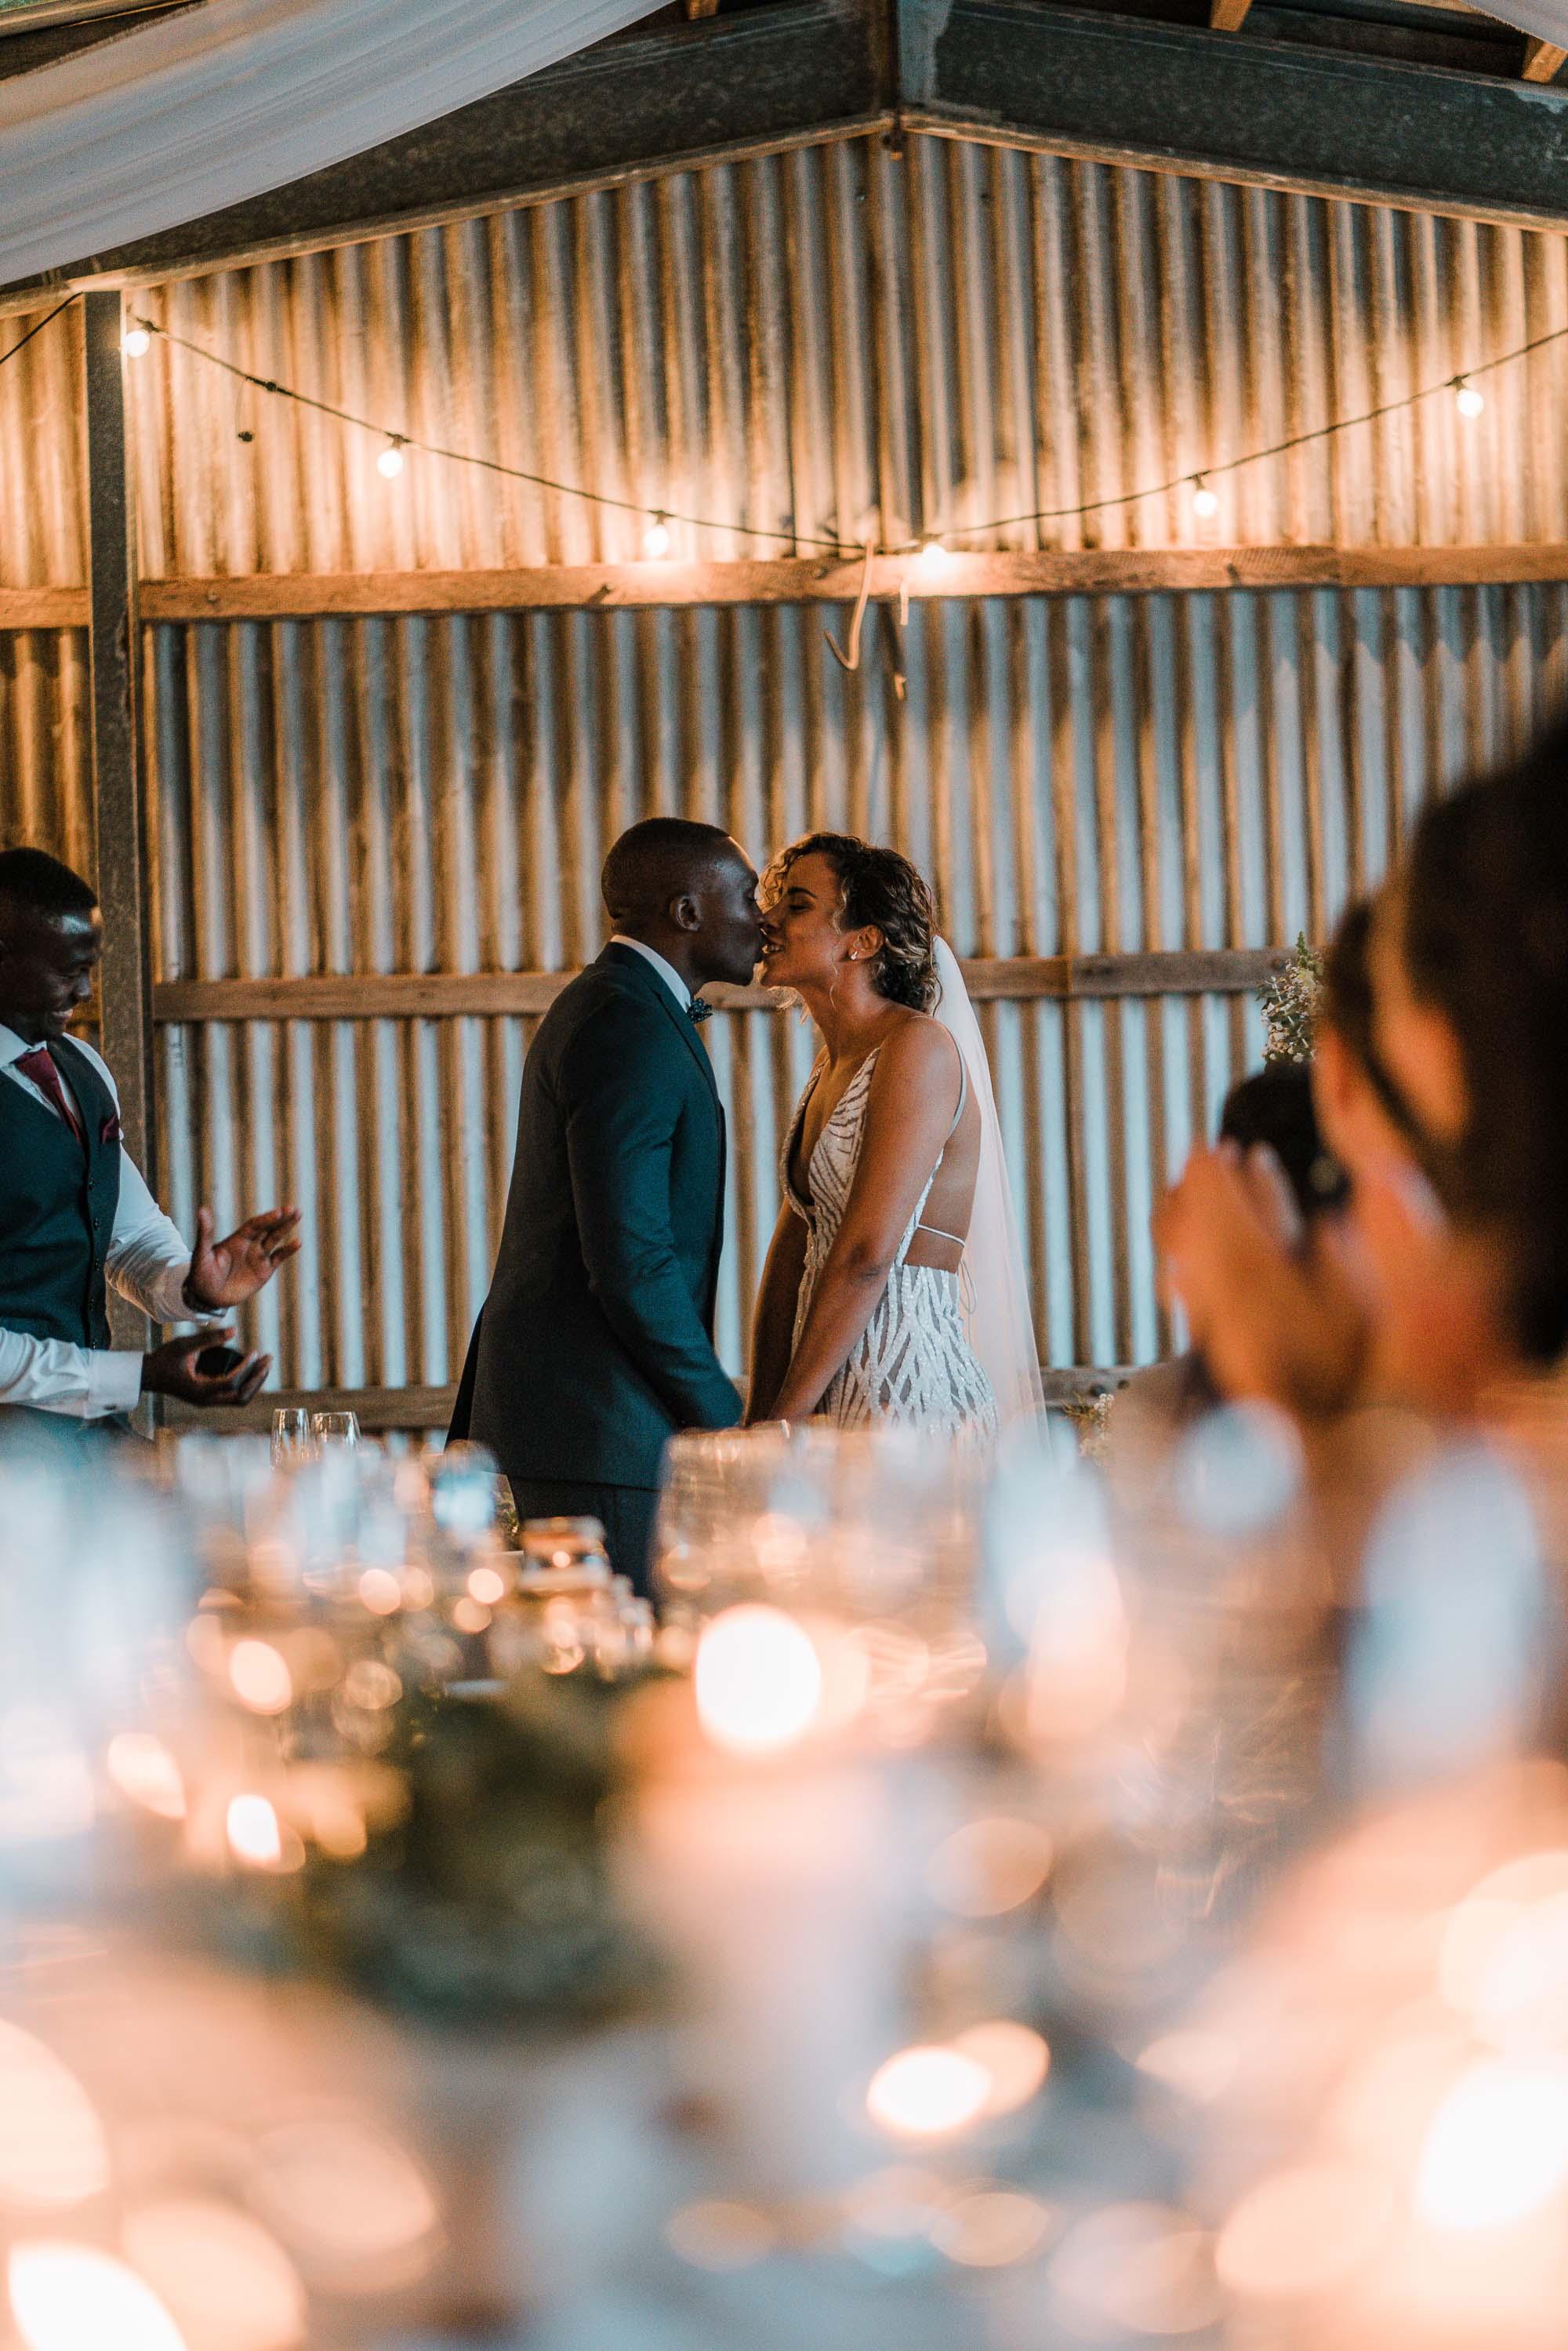 Ring True - Gold Coast Wedding Photographer 26.jpg